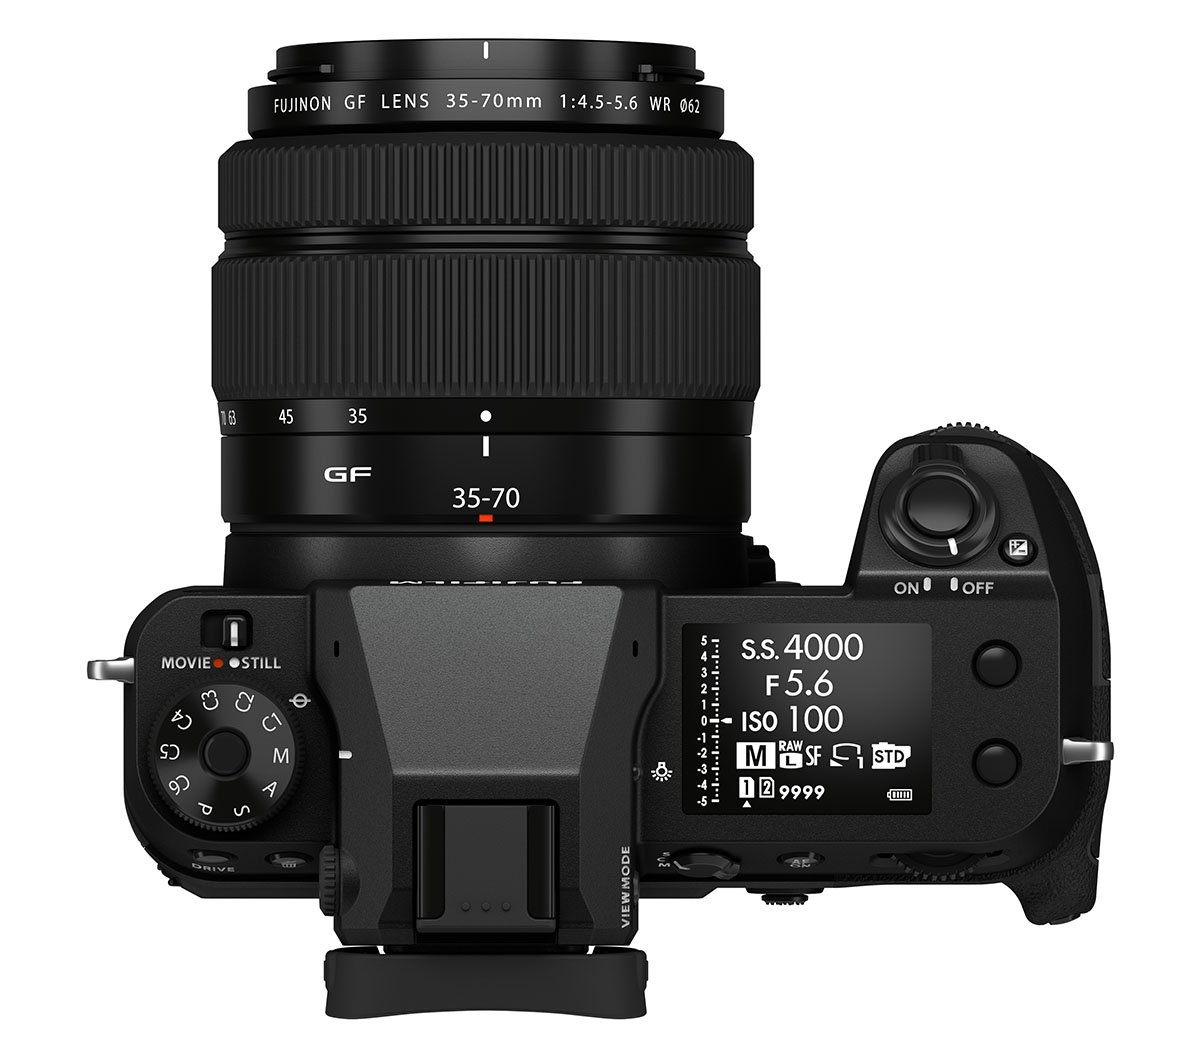 GFX50SII_top_GF35-70